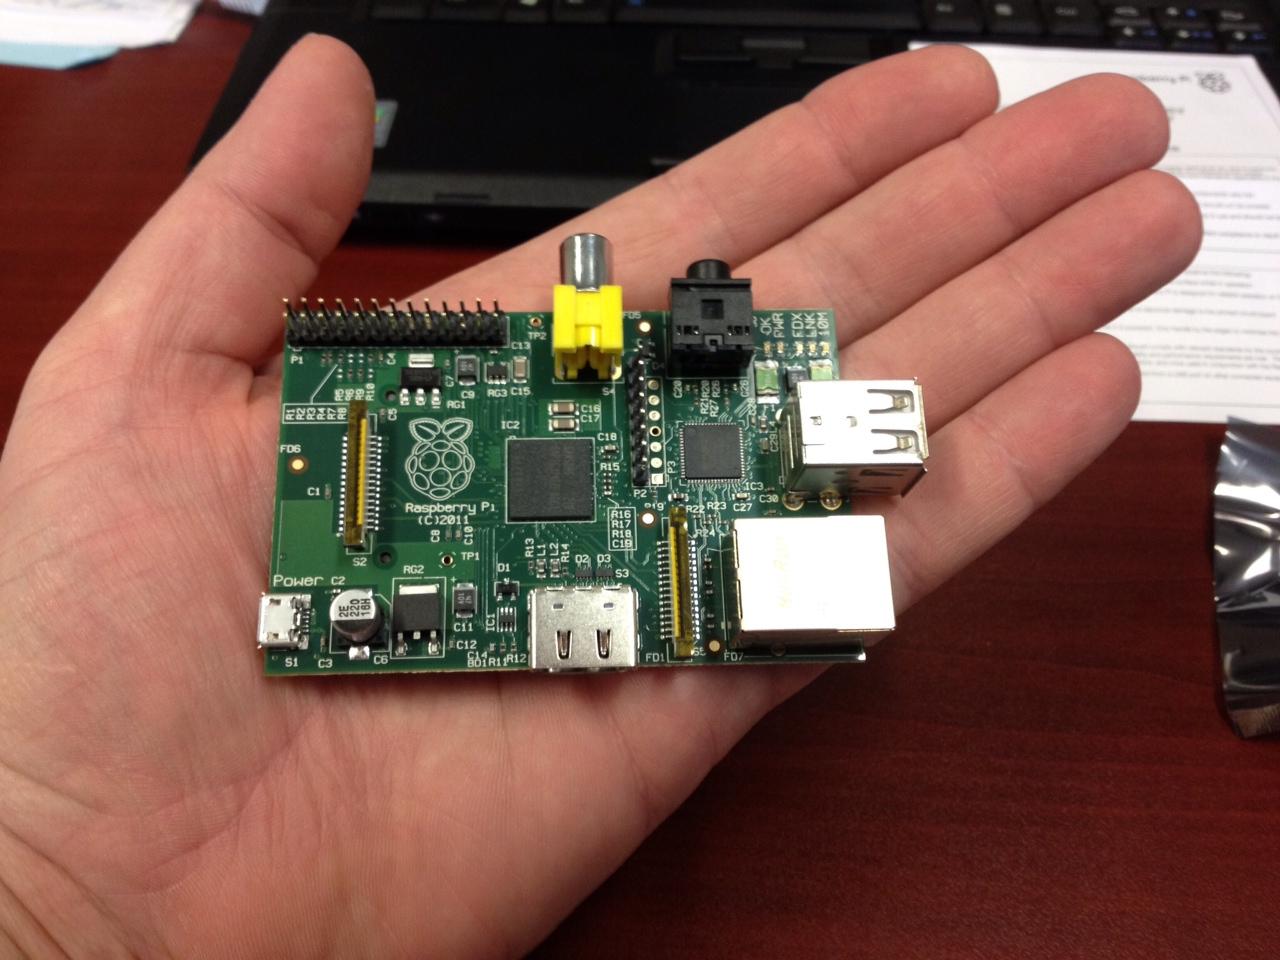 Apprend à programmer un Rasberry Pi